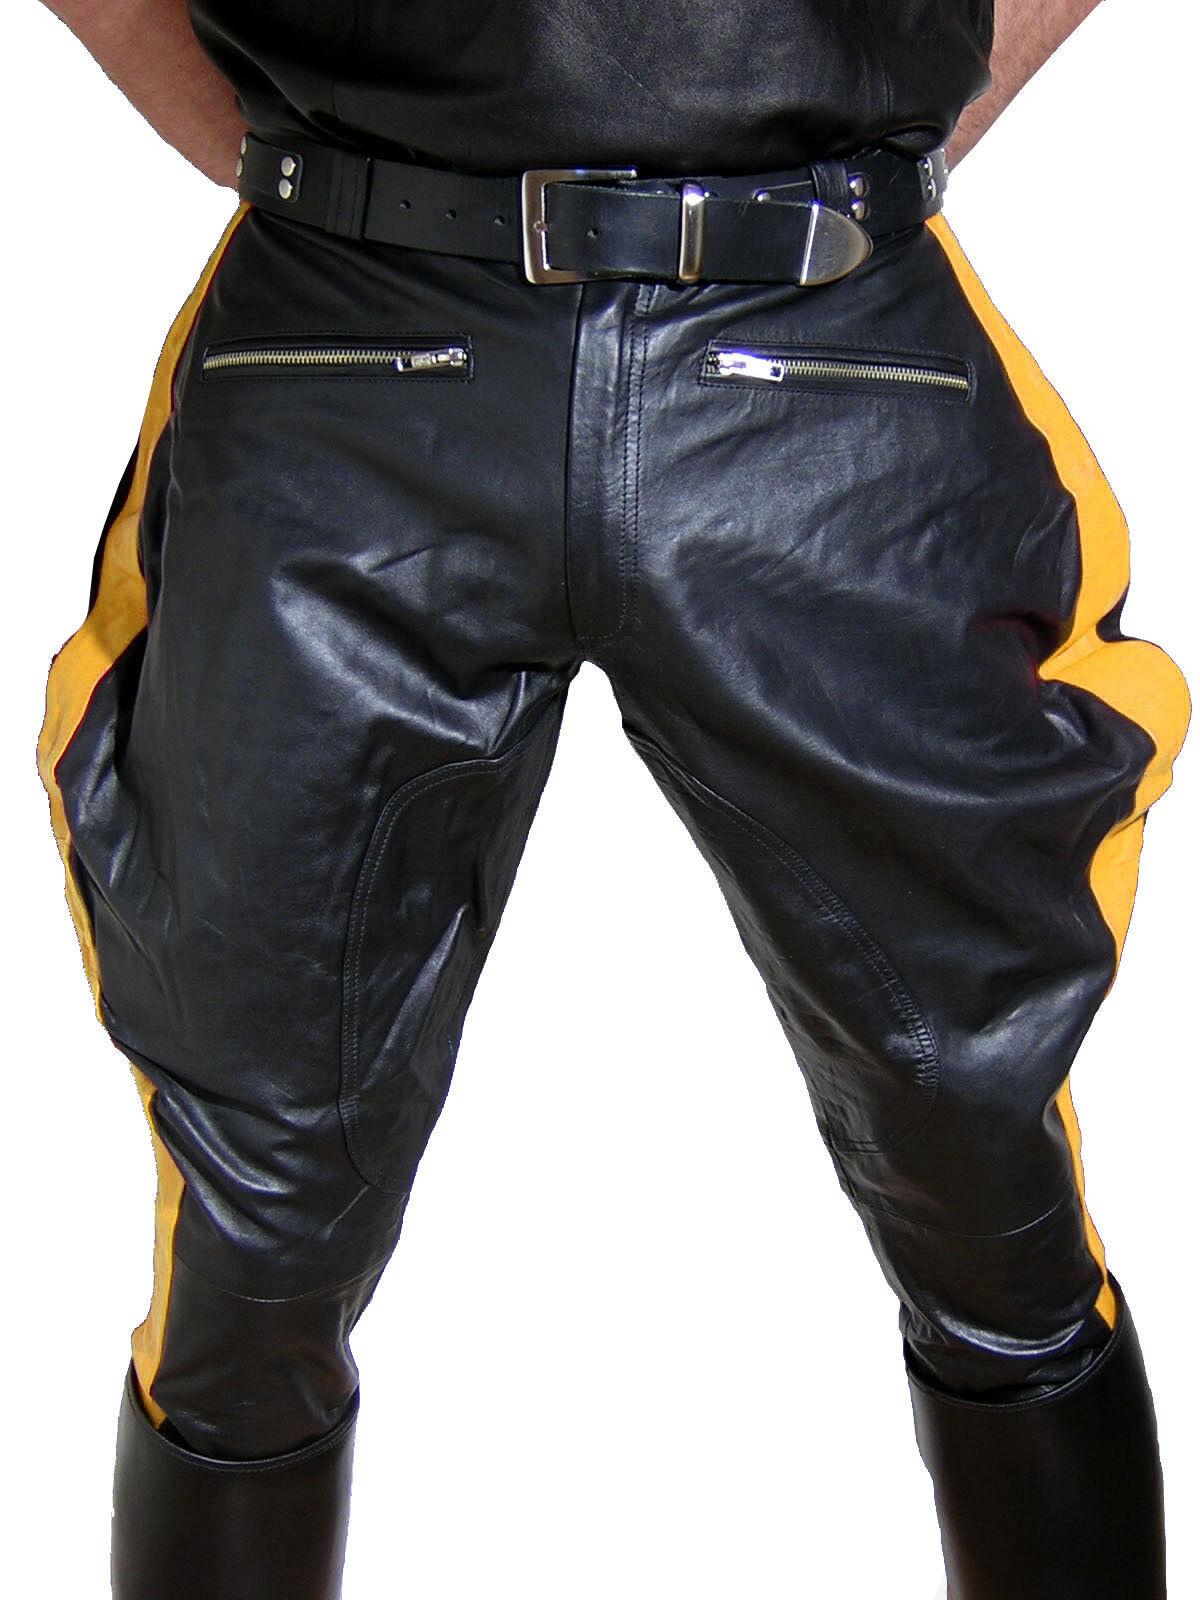 Lederhose strisce di Coloreeee gituttio Stivali Pantaloni nuovo breeches PANTALONI MOTO LEATHER PANTS nuovo